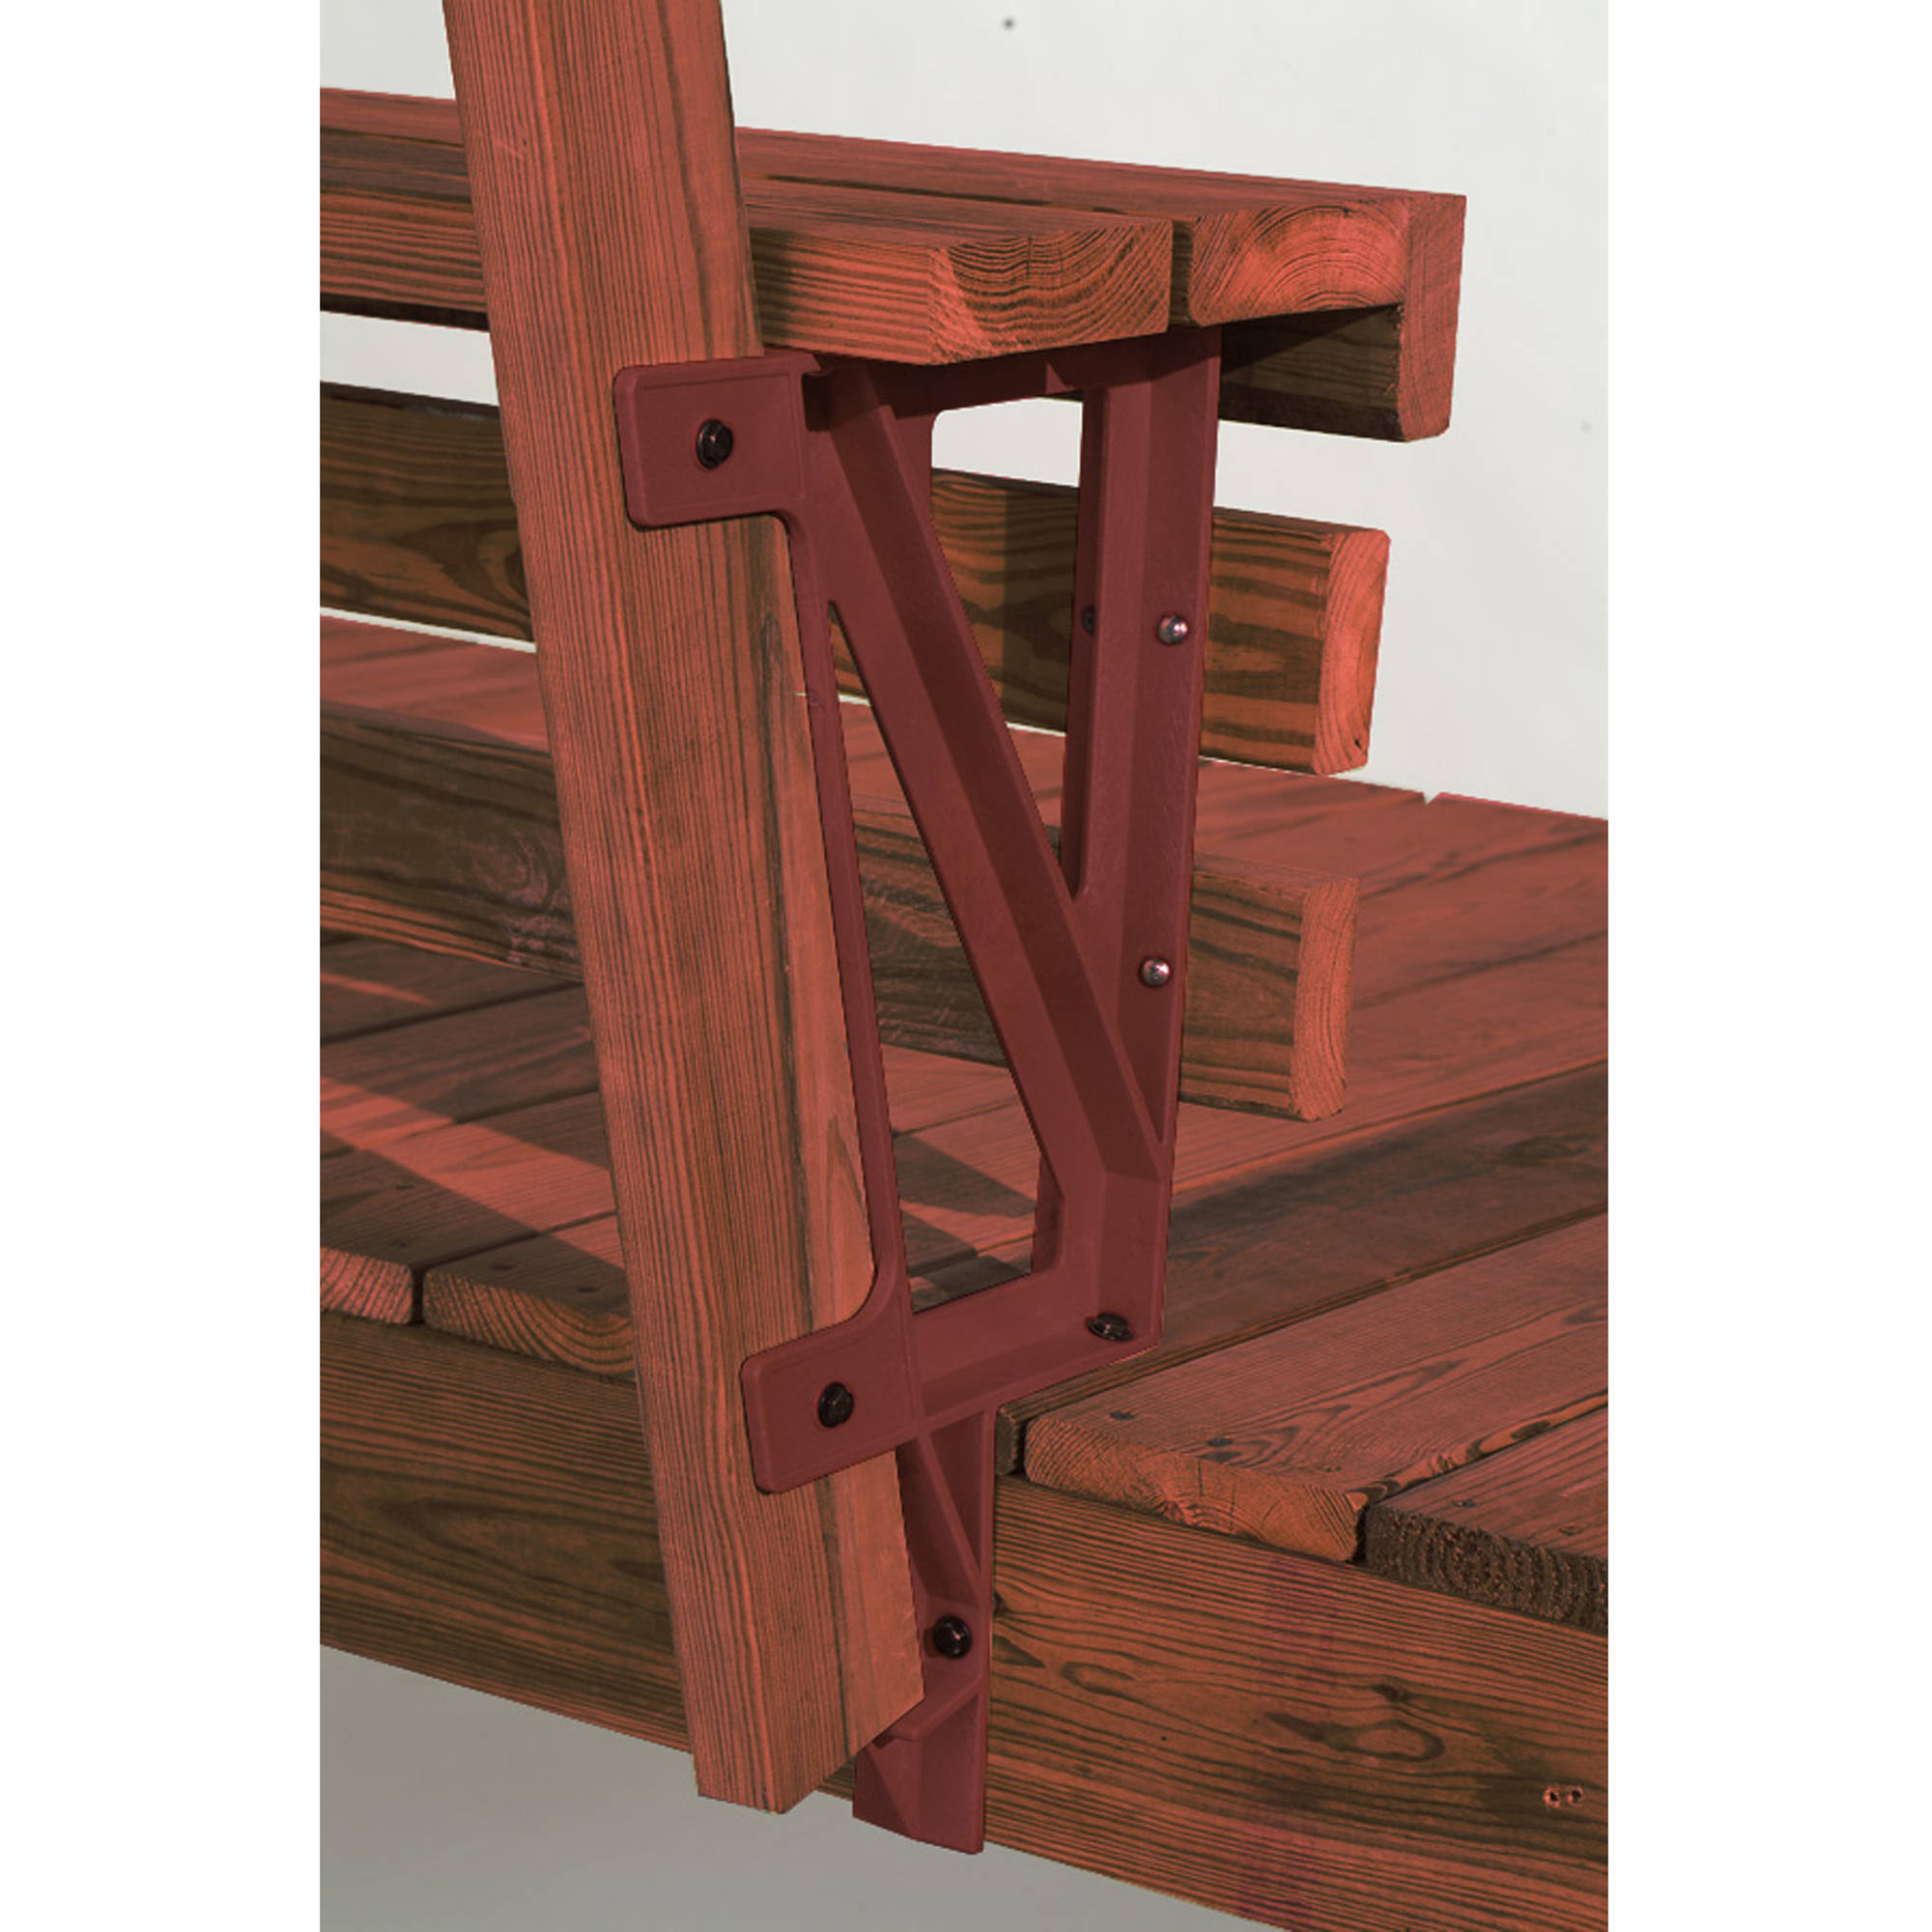 Image of 2x4 Basics Dekmate Bench Bracket, Redwood, 2-Pack